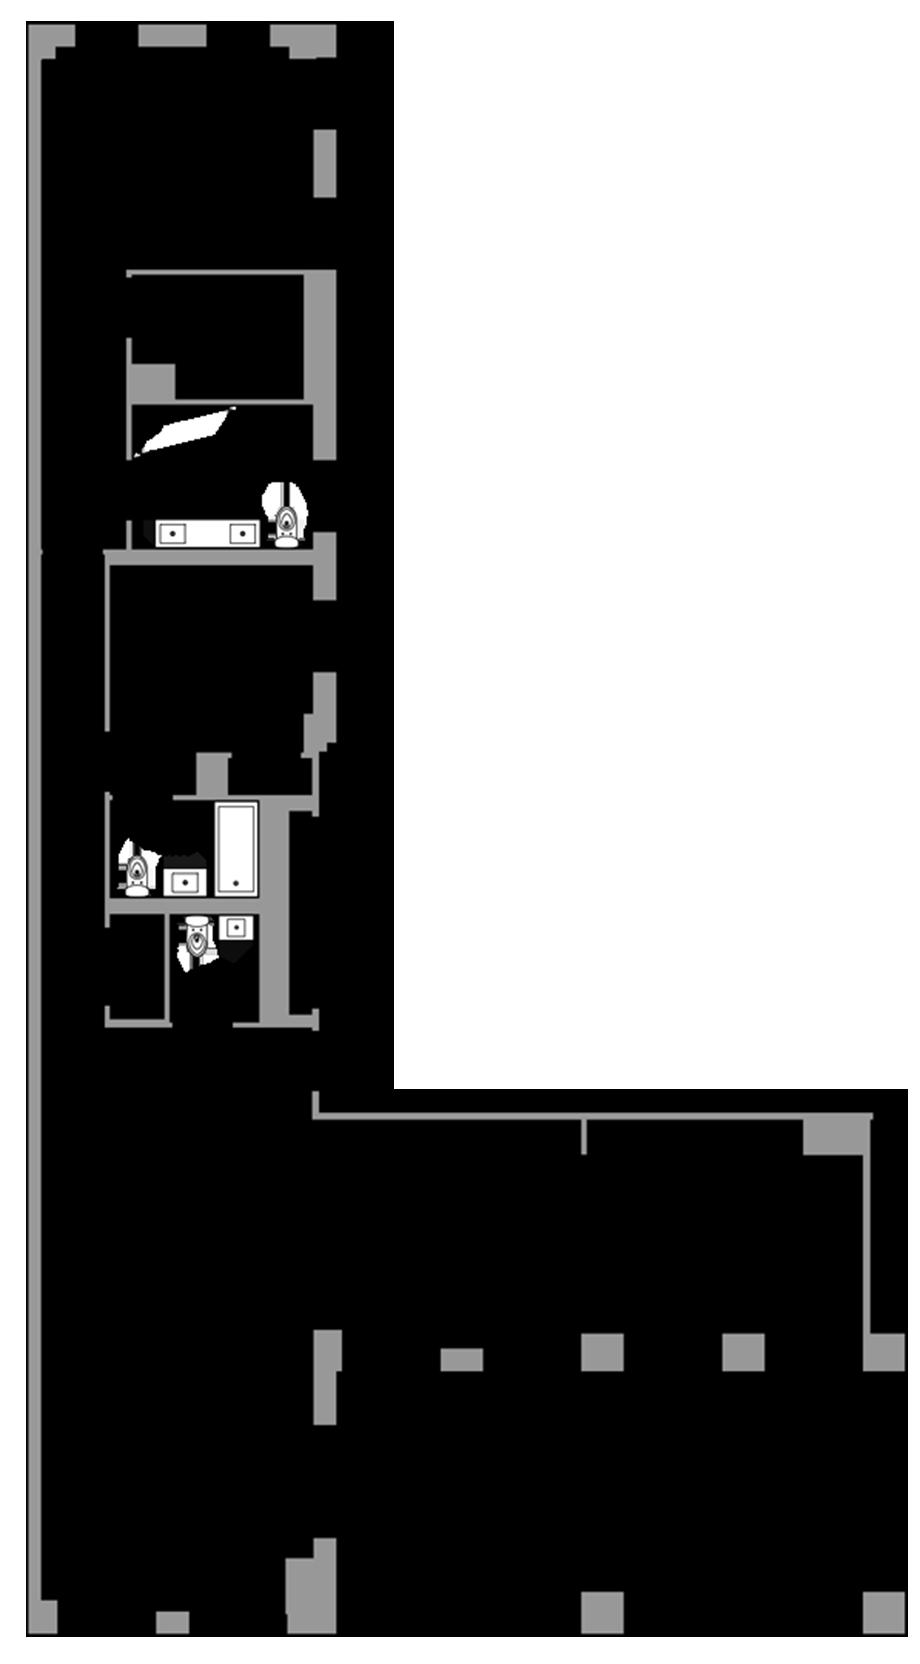 Residence 1301